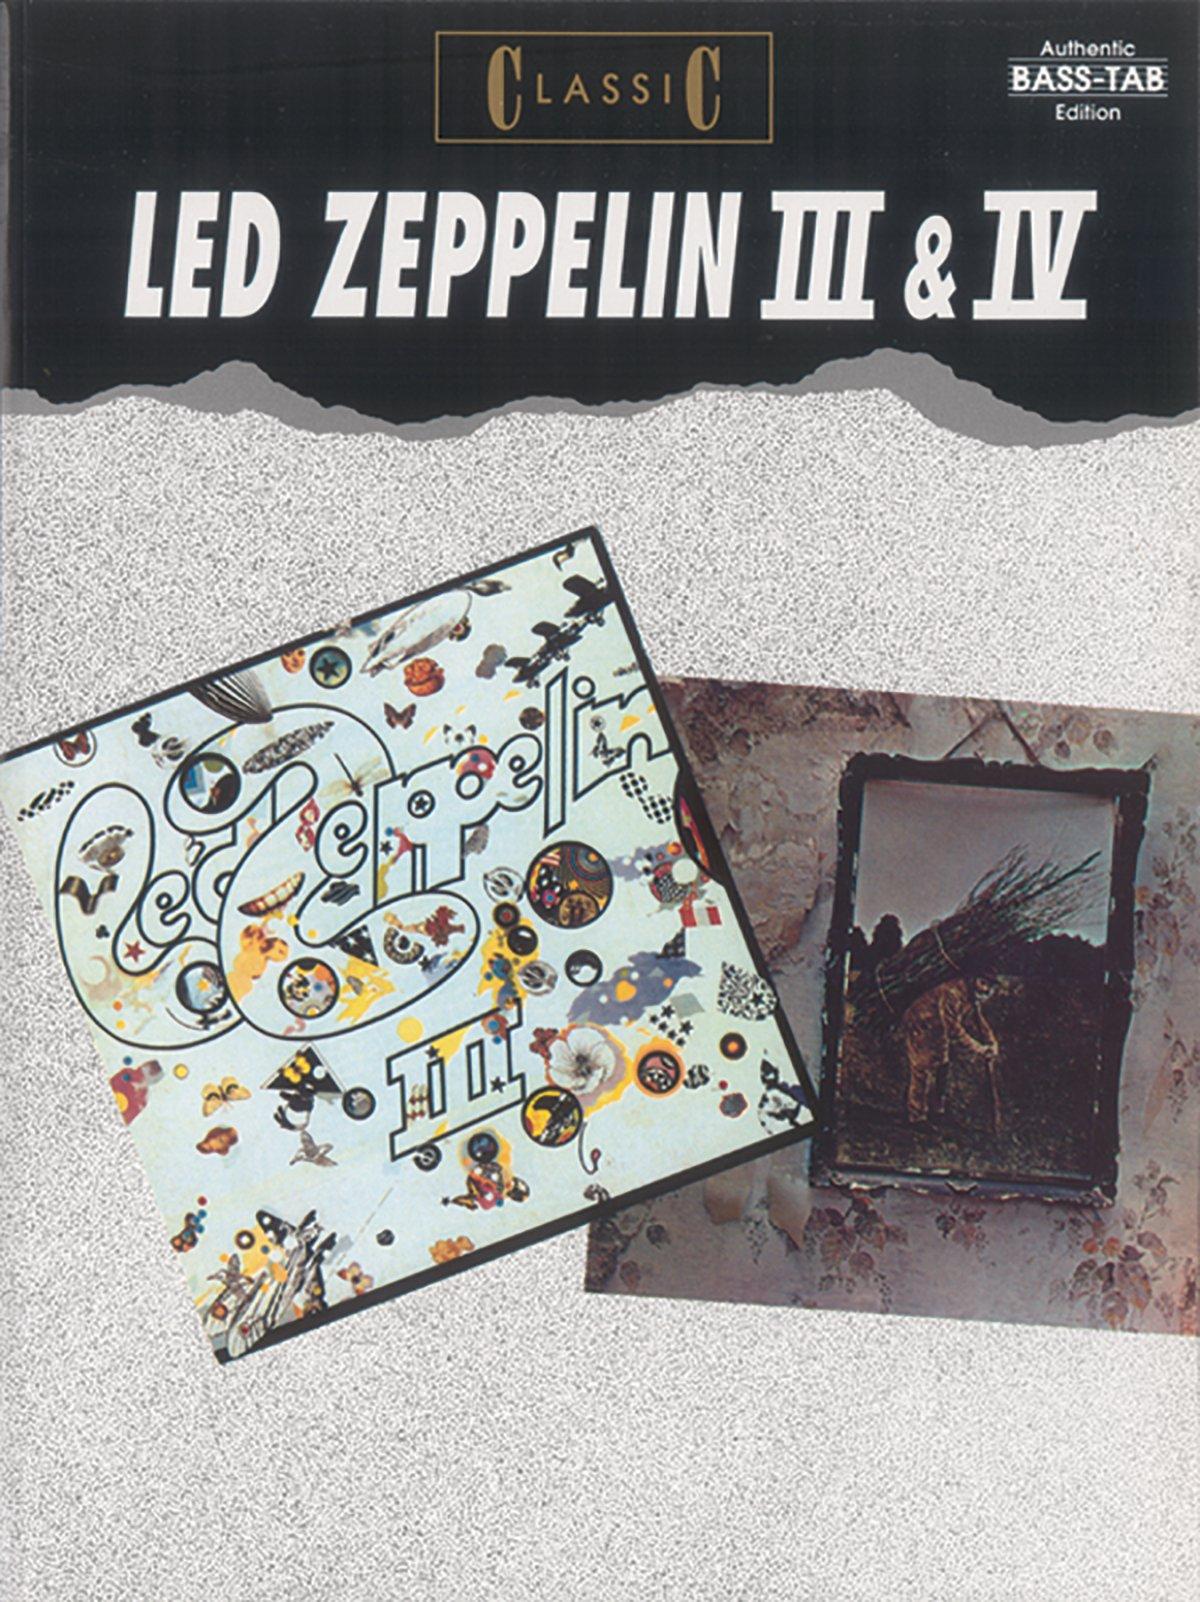 classic-led-zeppelin-iii-iv-bass-tab